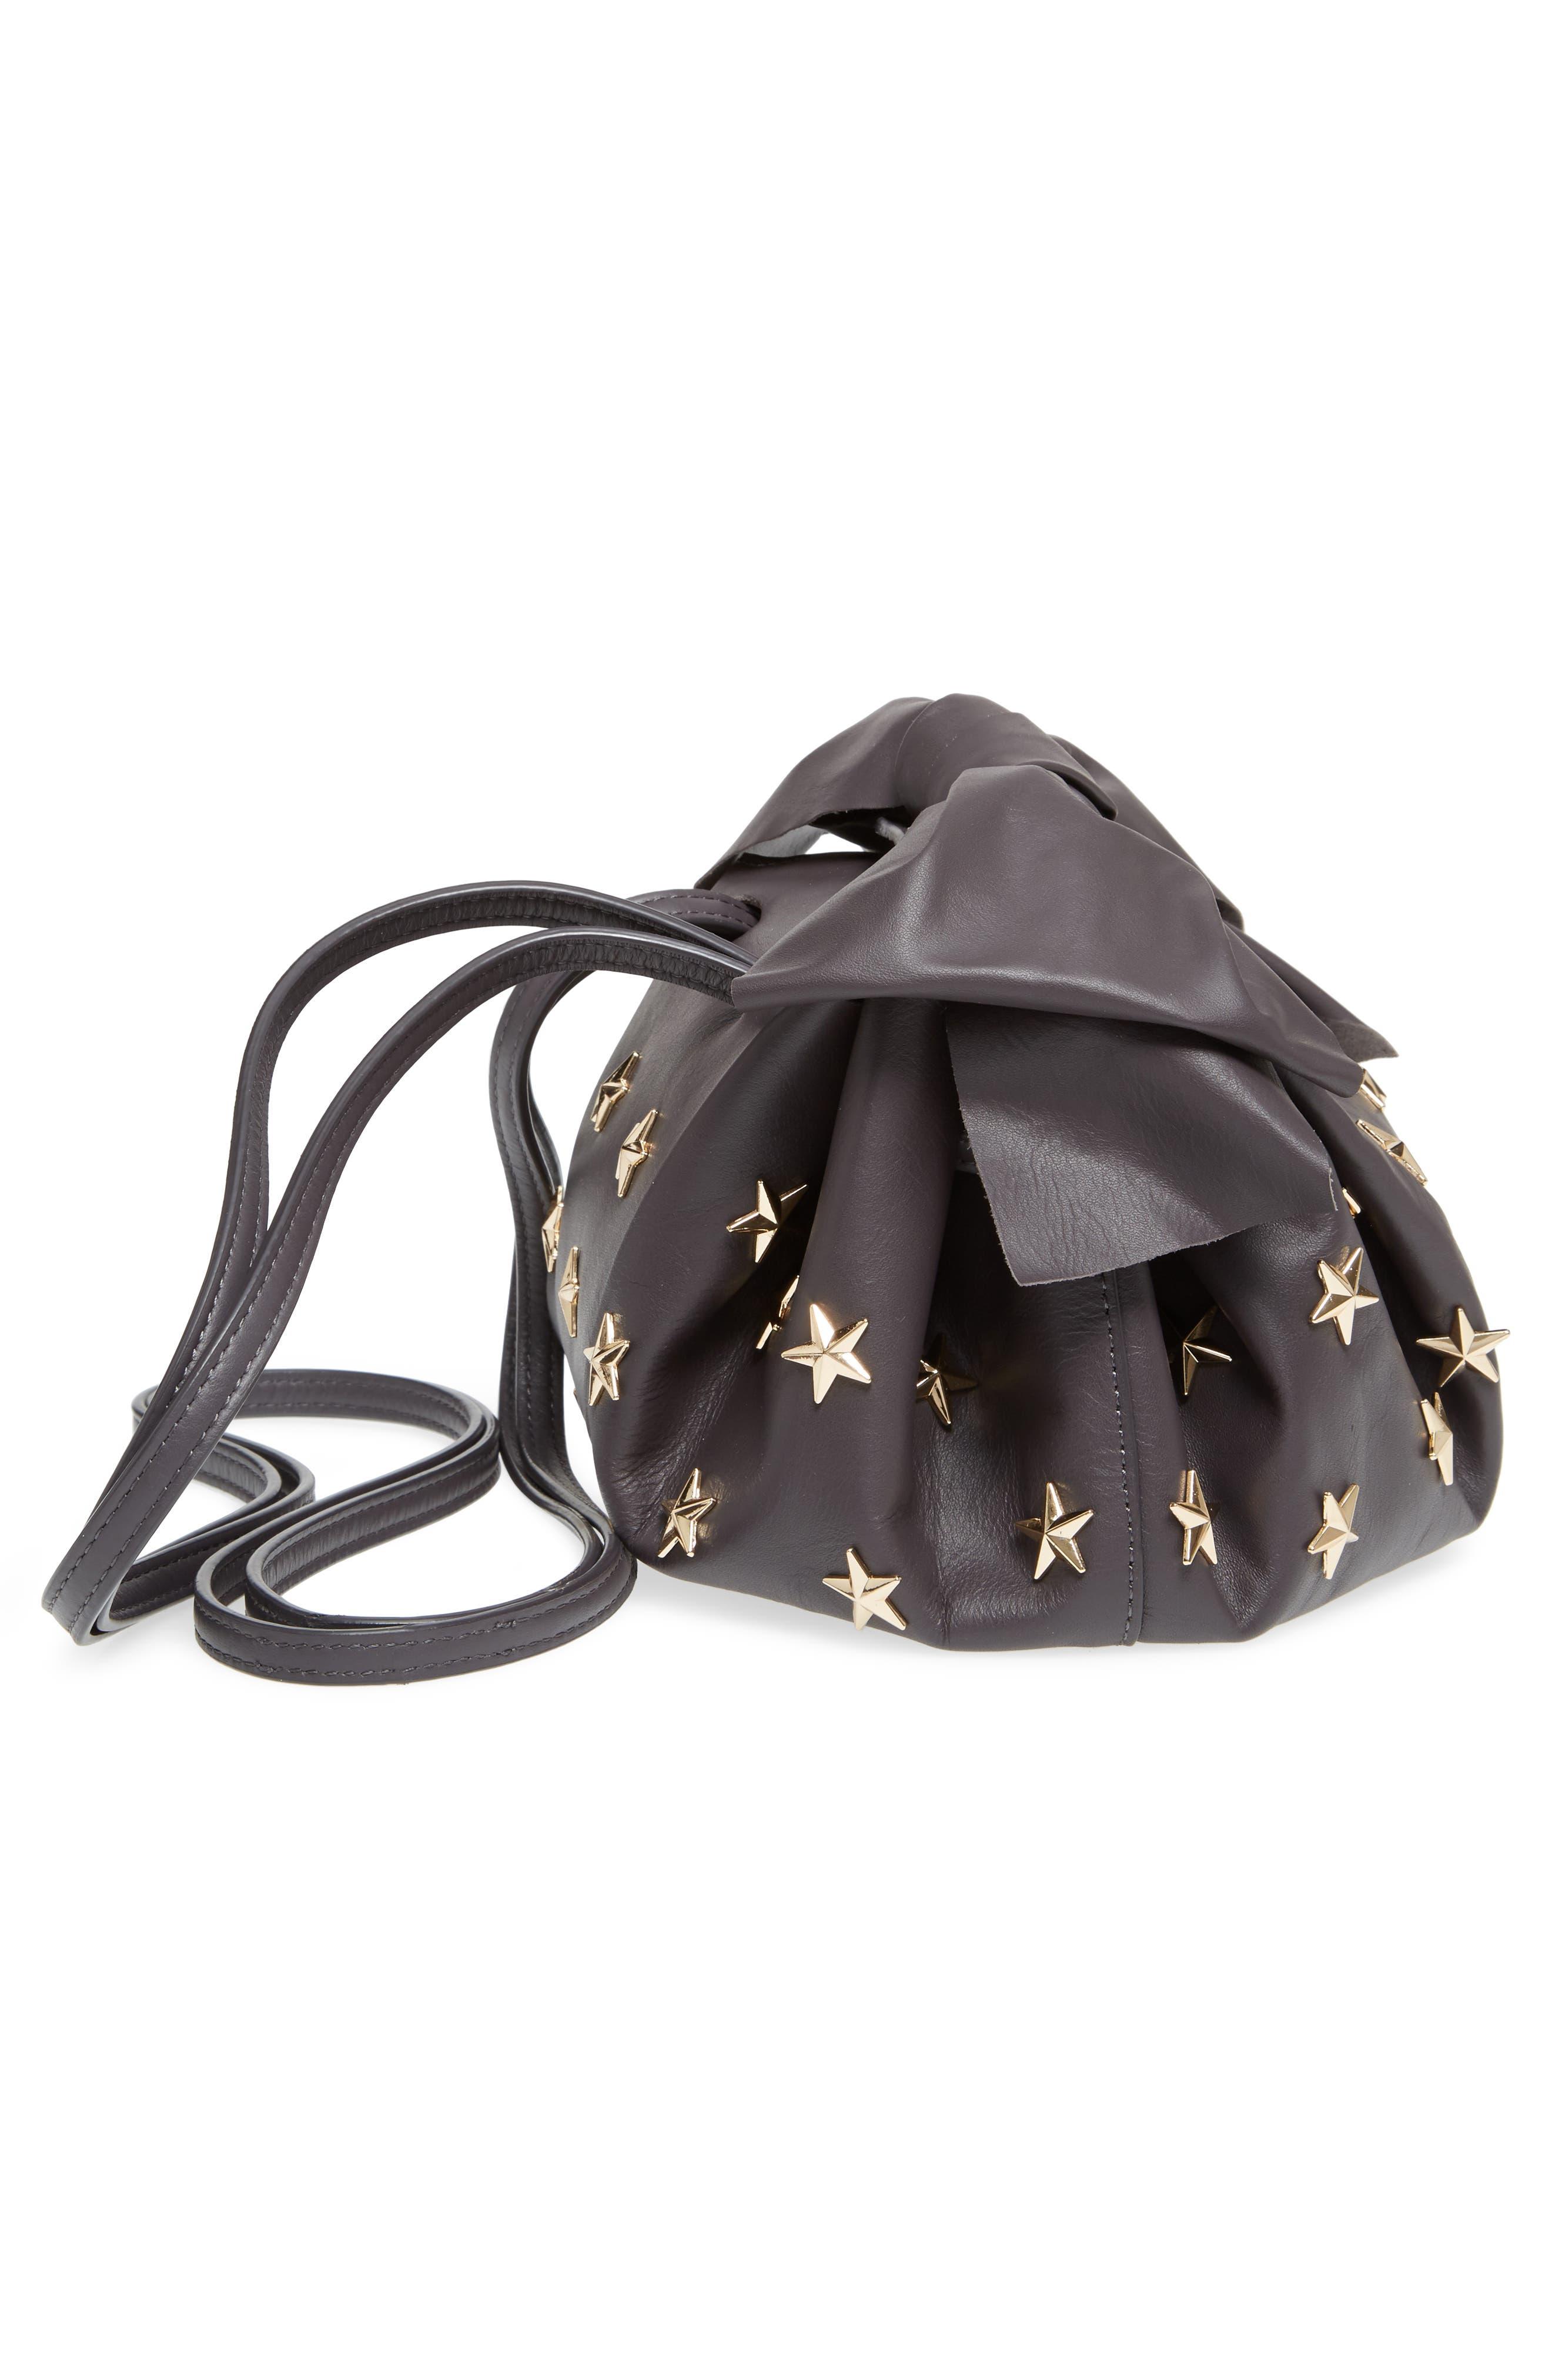 Soirée Star Stud Leather Crossbody Bag,                             Alternate thumbnail 5, color,